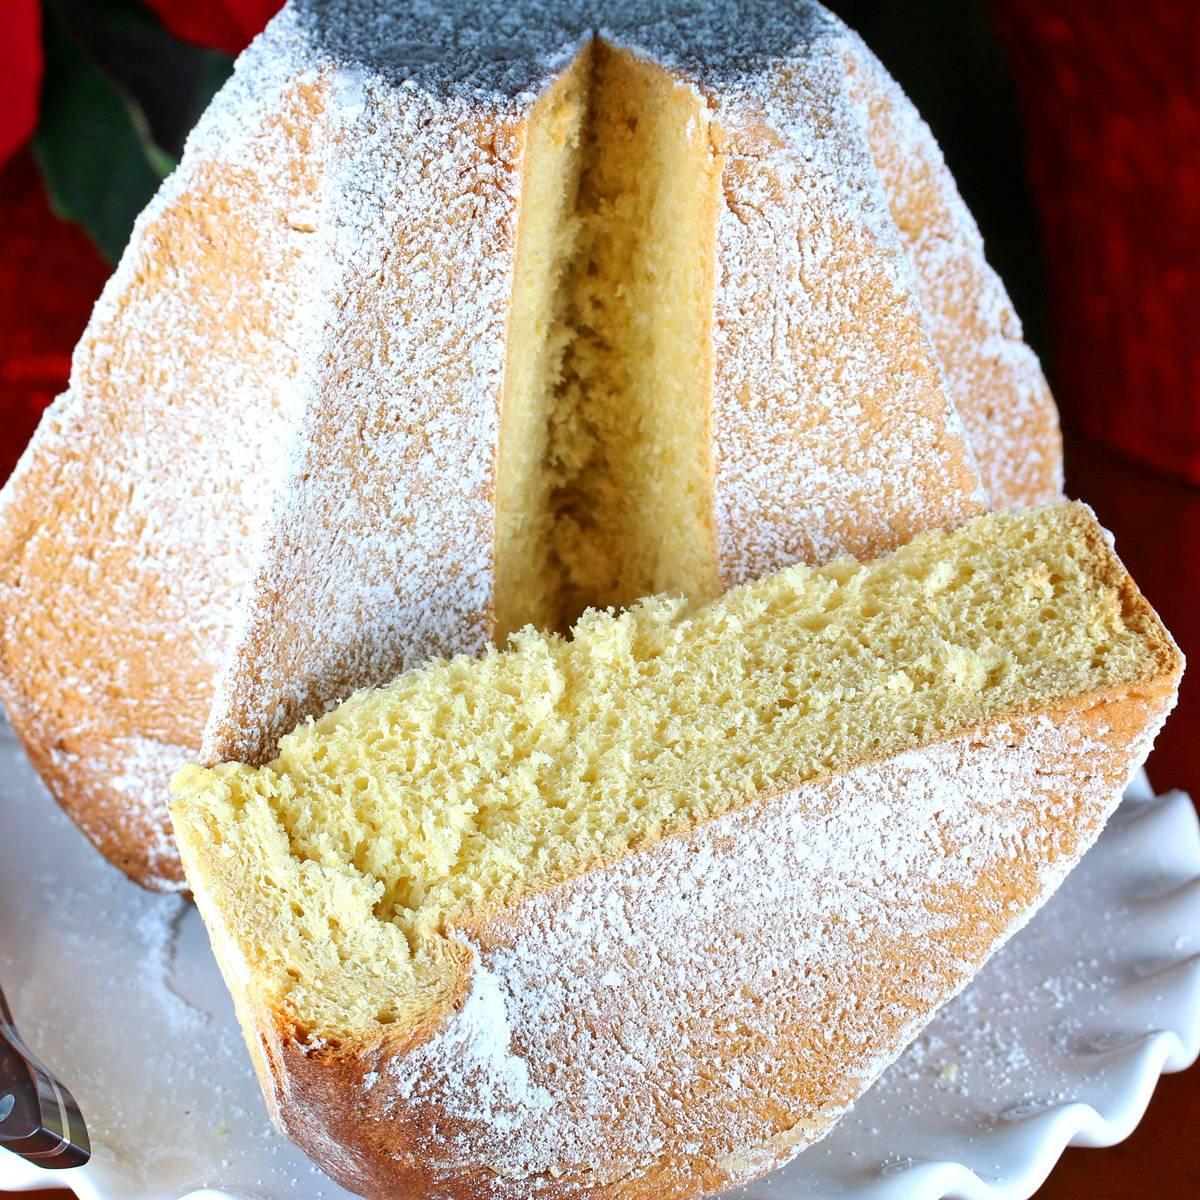 pandoro recipe traditional authentic Verona Christmas bread cake yeast lemon best Italian